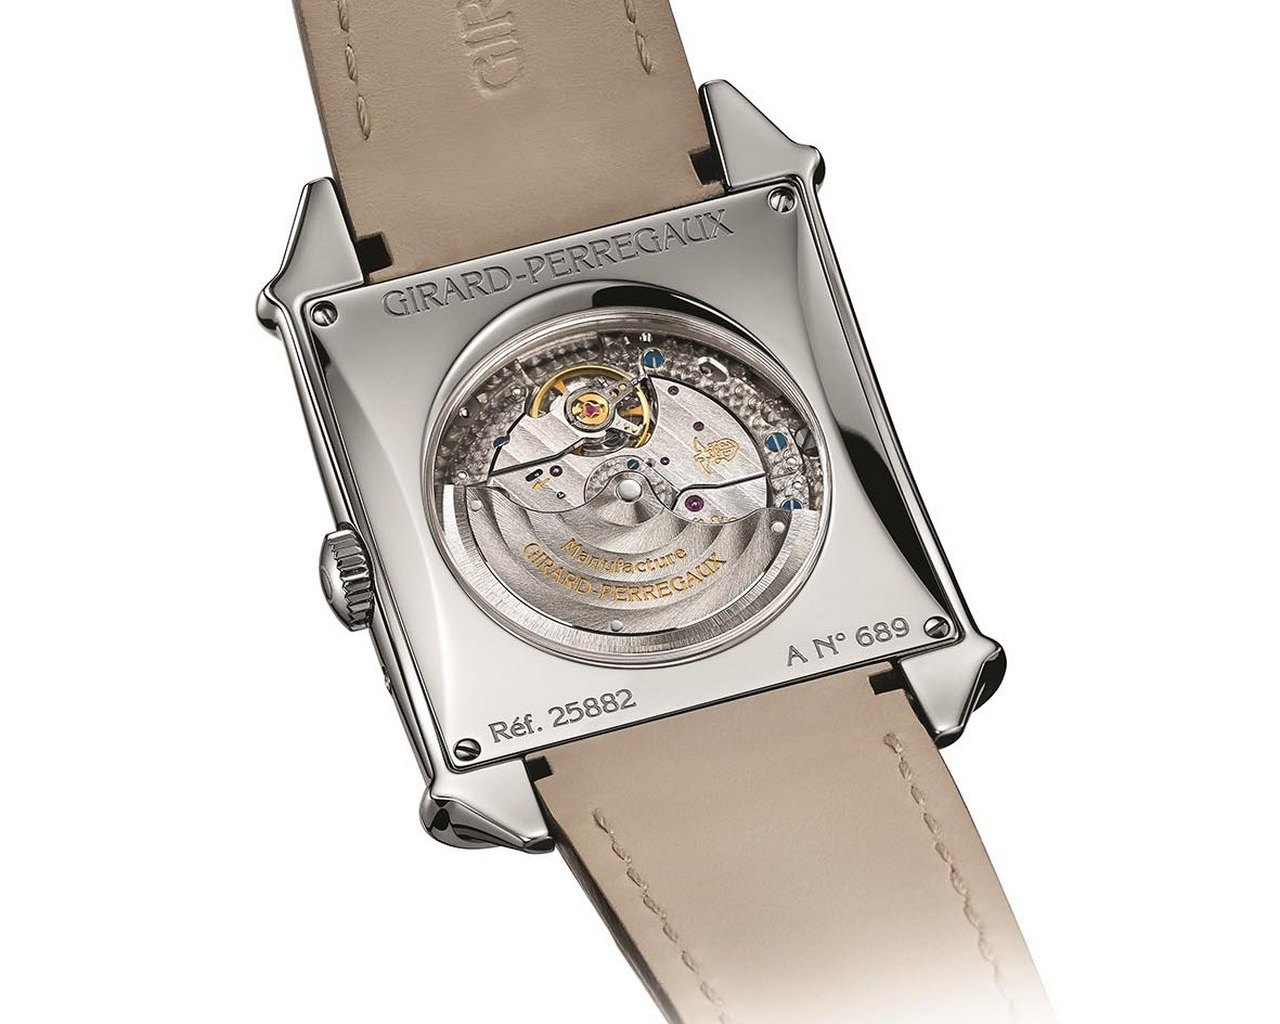 girard-perregaux-vintage-1945-gran-data-ref-25882-11-223-bb6b-ref-25882-52-222-bb6b-prezzo-price-0-100_12